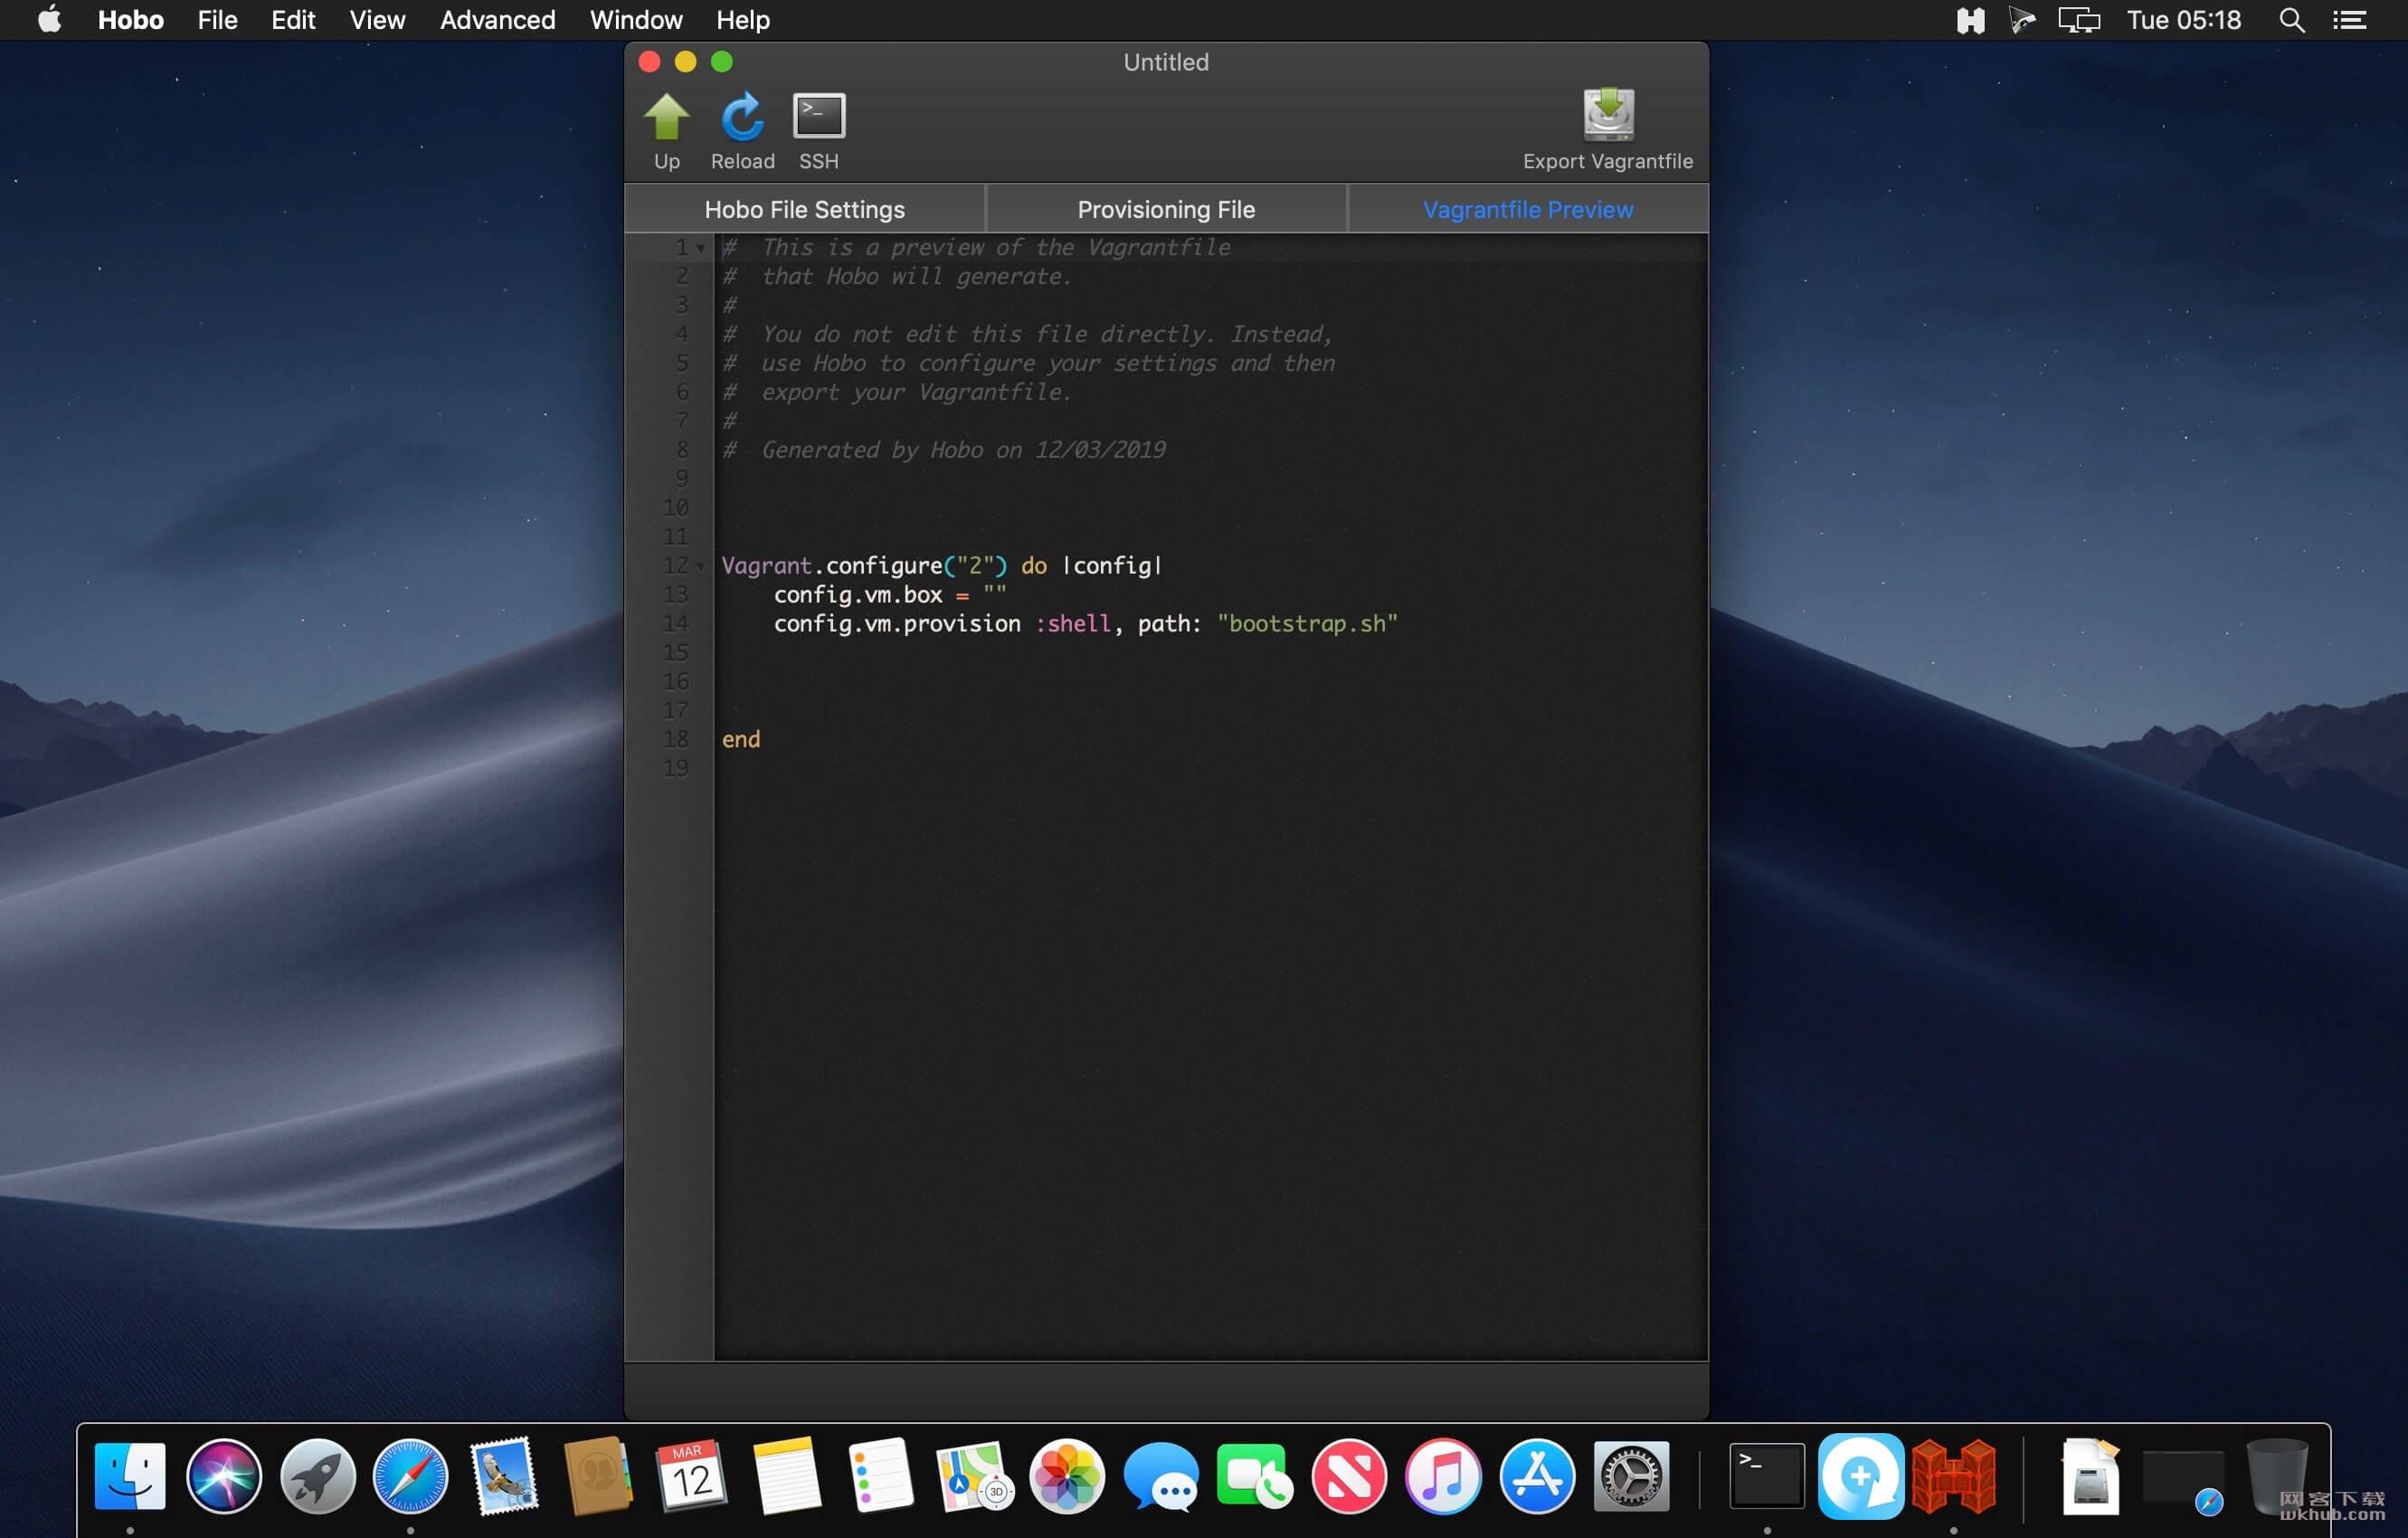 Hobo 1.5.0 Vagrant虚拟机客户端